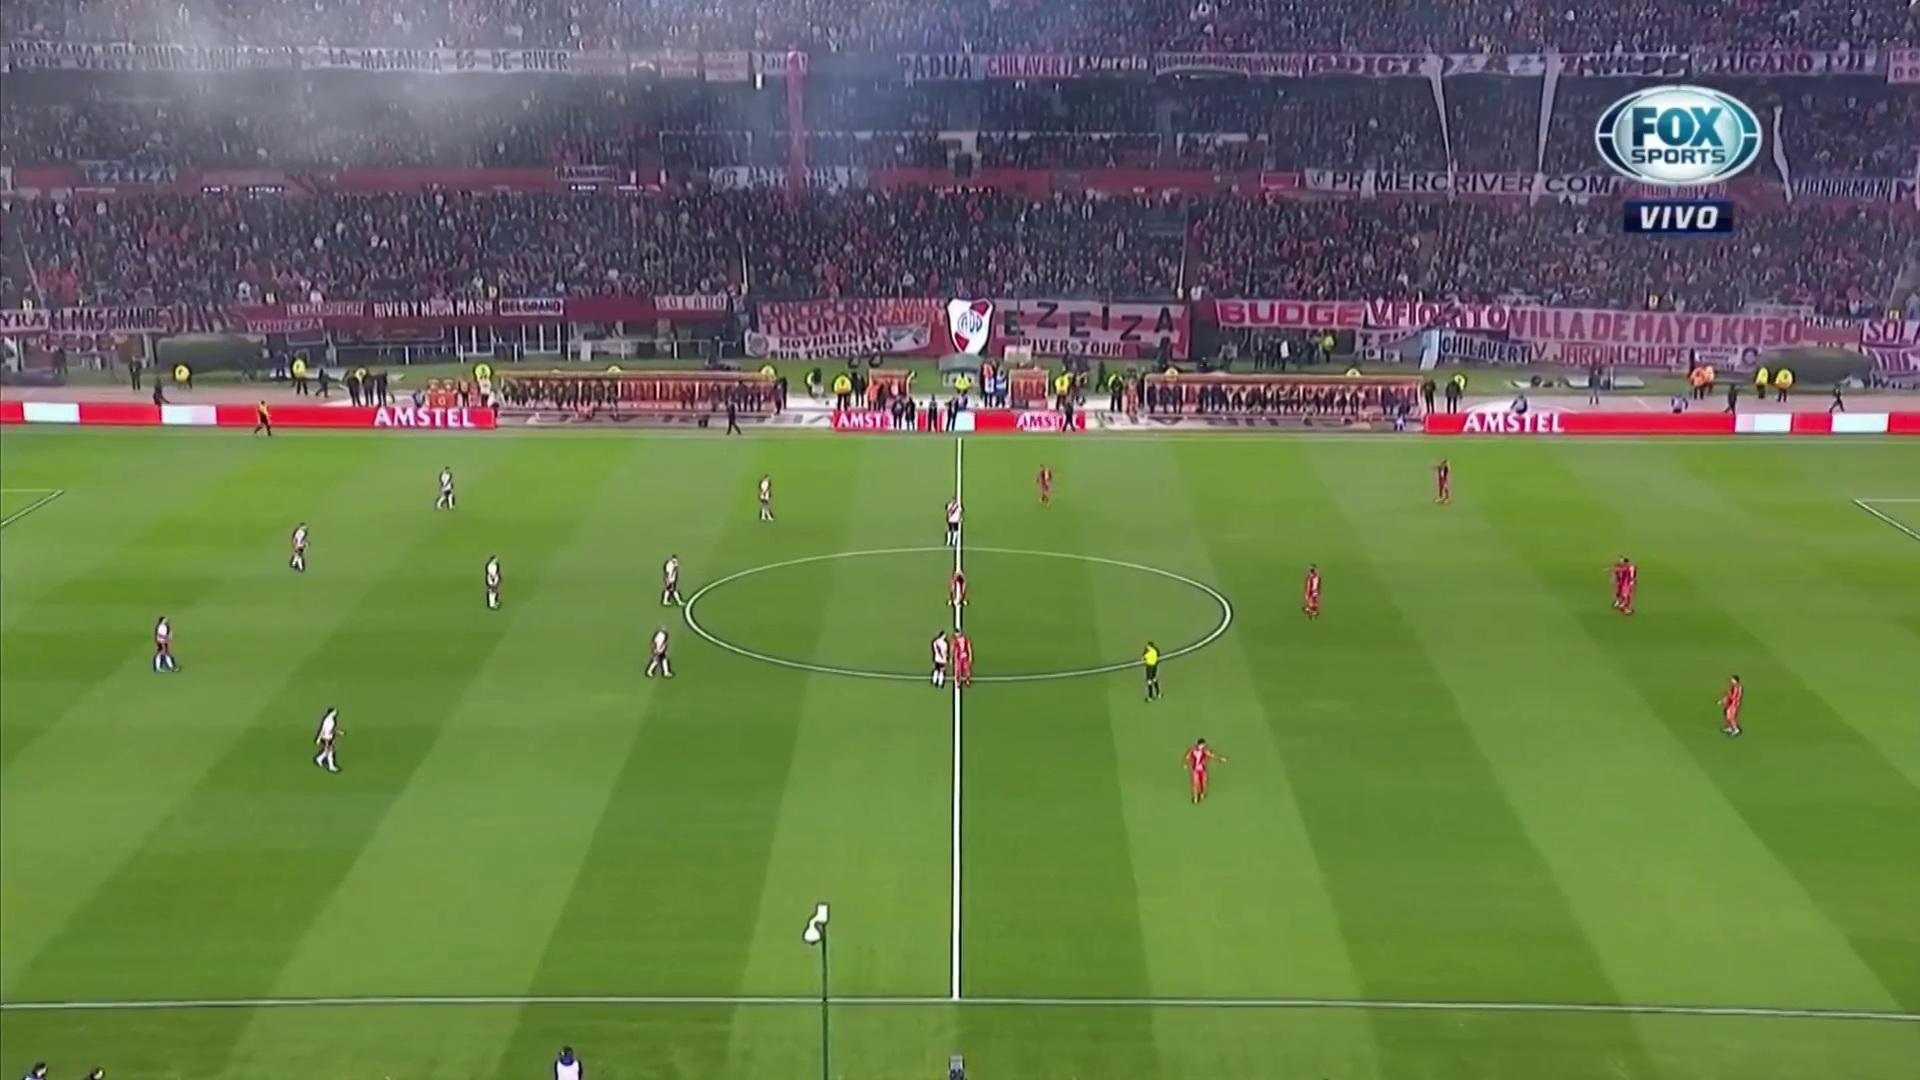 Copa Libertadores 2019 - Cuartos de Final - Ida - River Plate Vs. Cerro Porteño (1080p) (Español Latino) 514